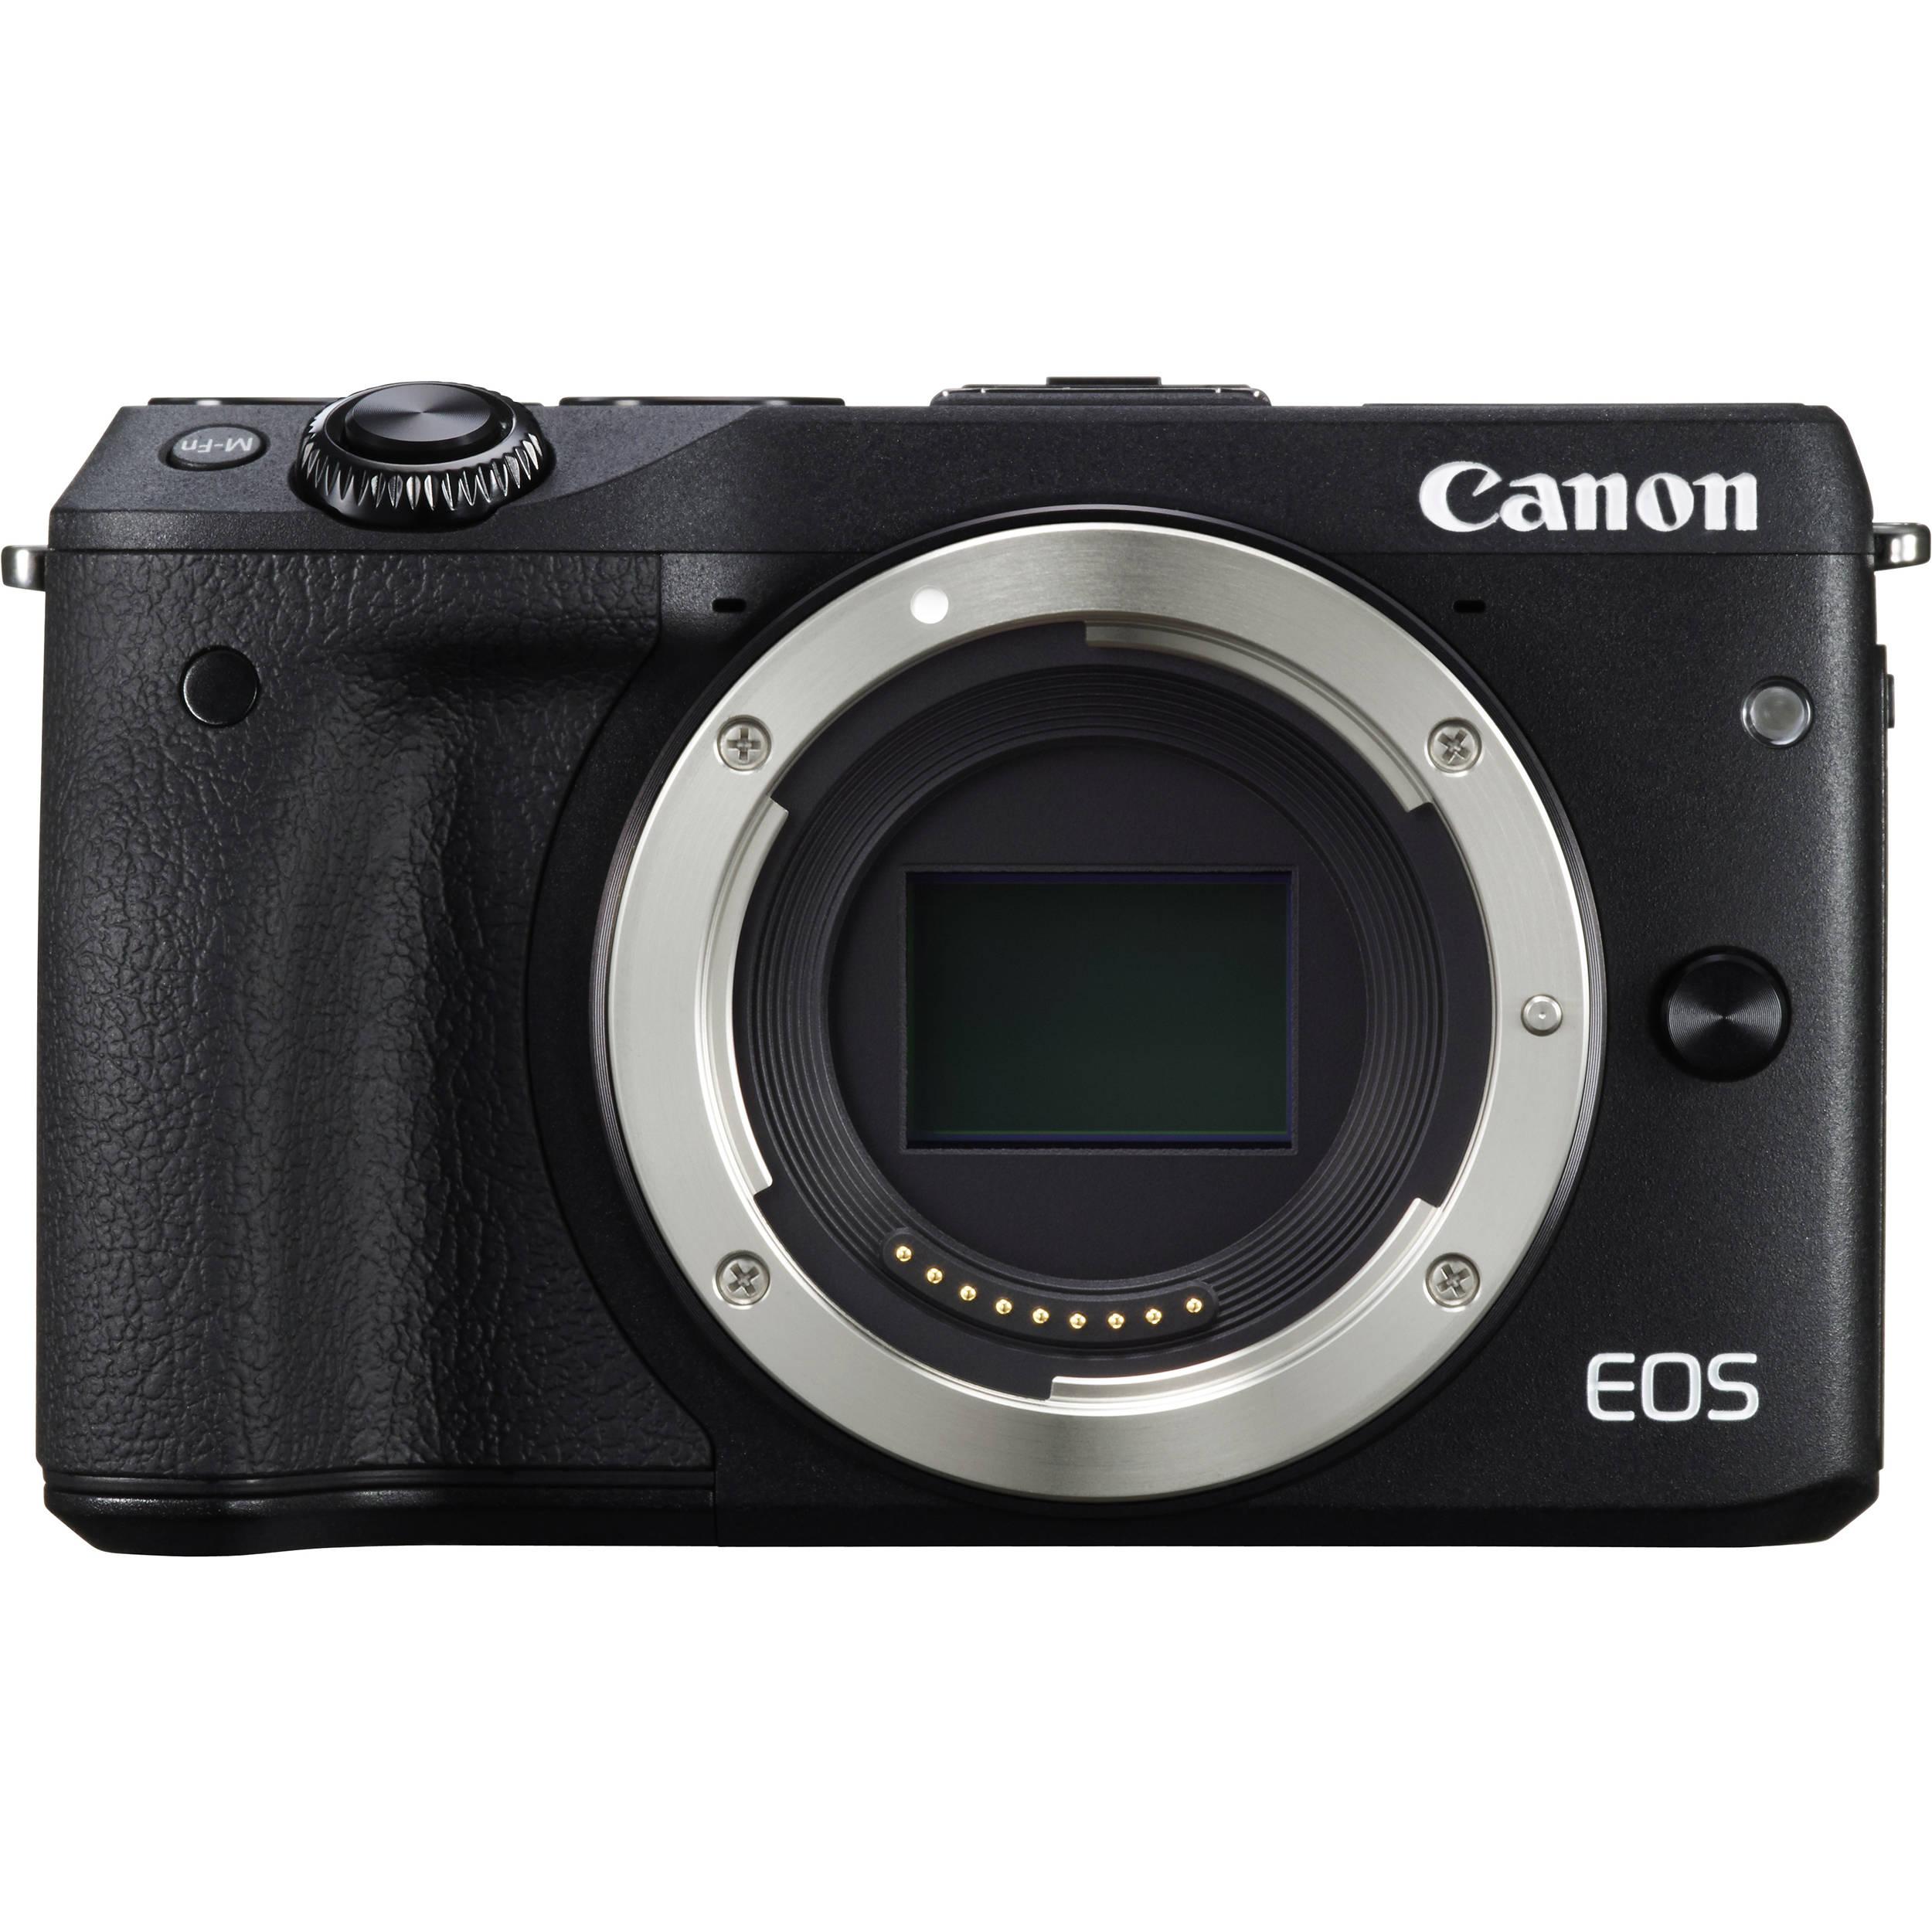 canon eos m3 mirrorless digital camera 9694b001 b h photo. Black Bedroom Furniture Sets. Home Design Ideas